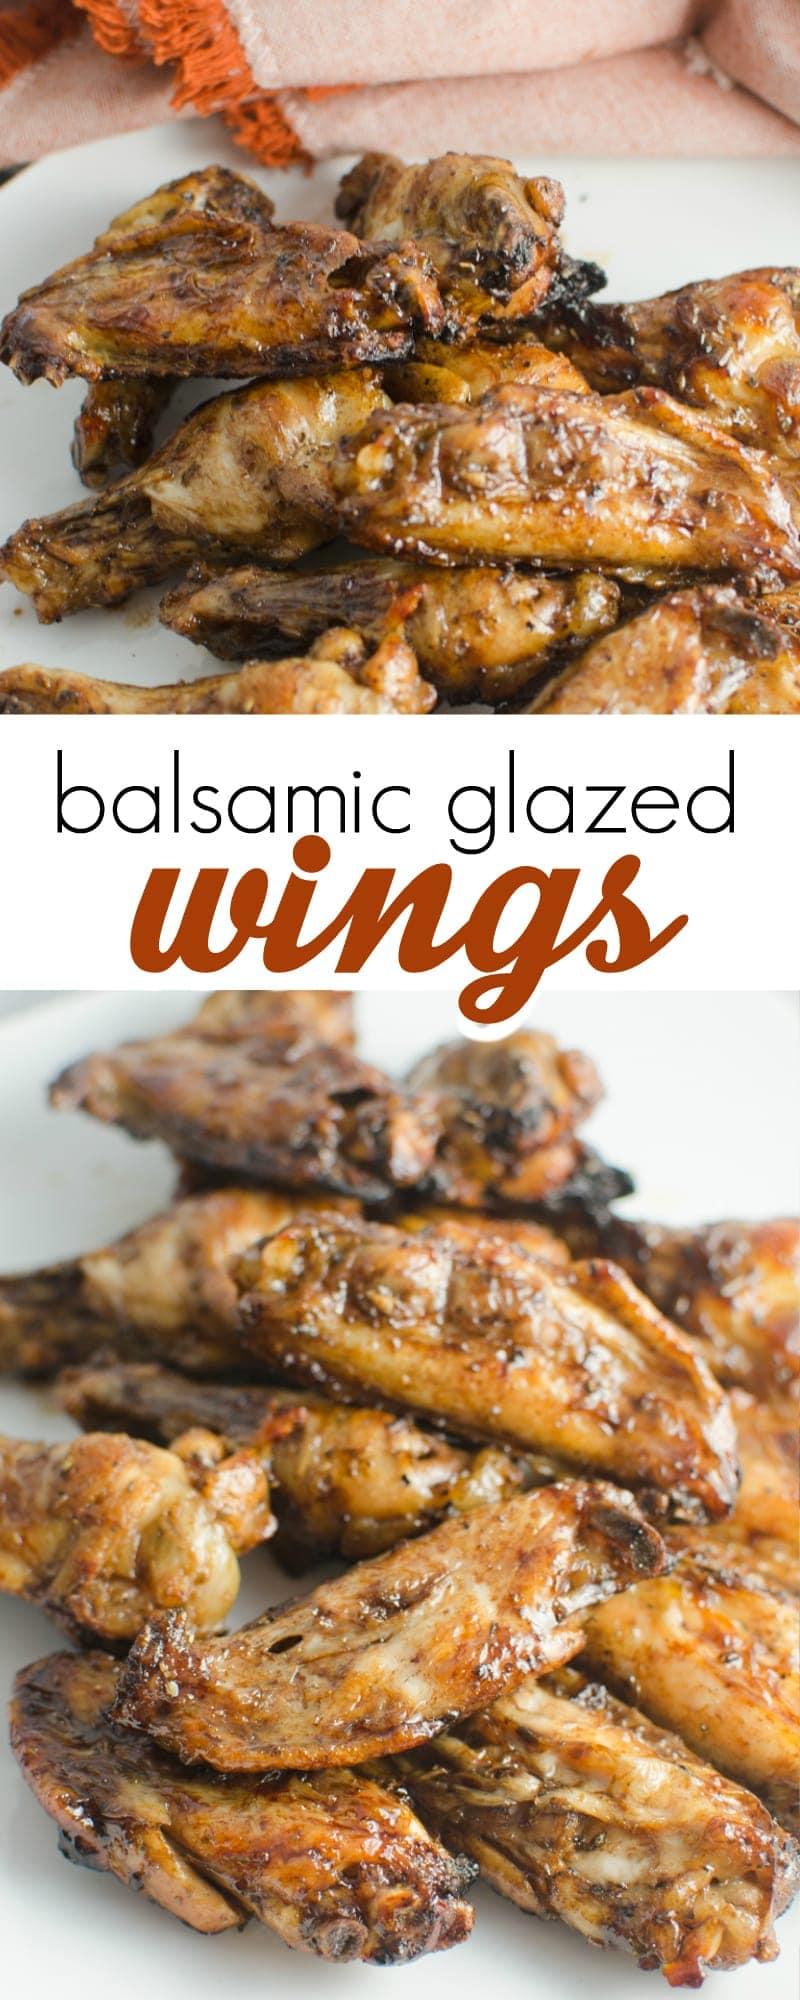 balsamic glazed wings